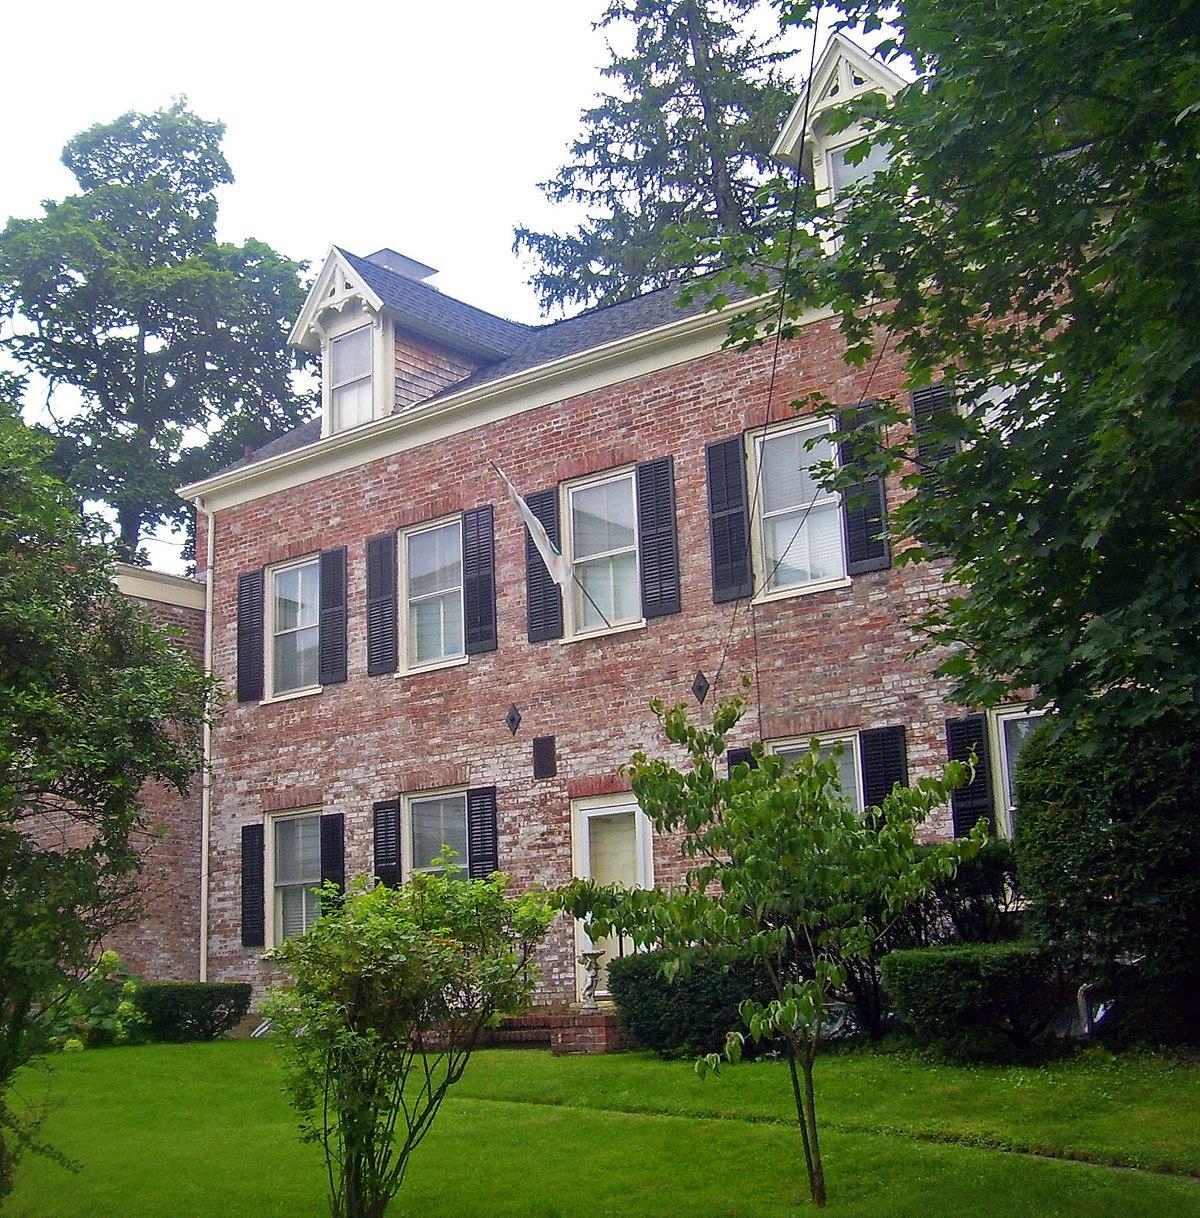 Elisha williams house wikipedia for Hudson house